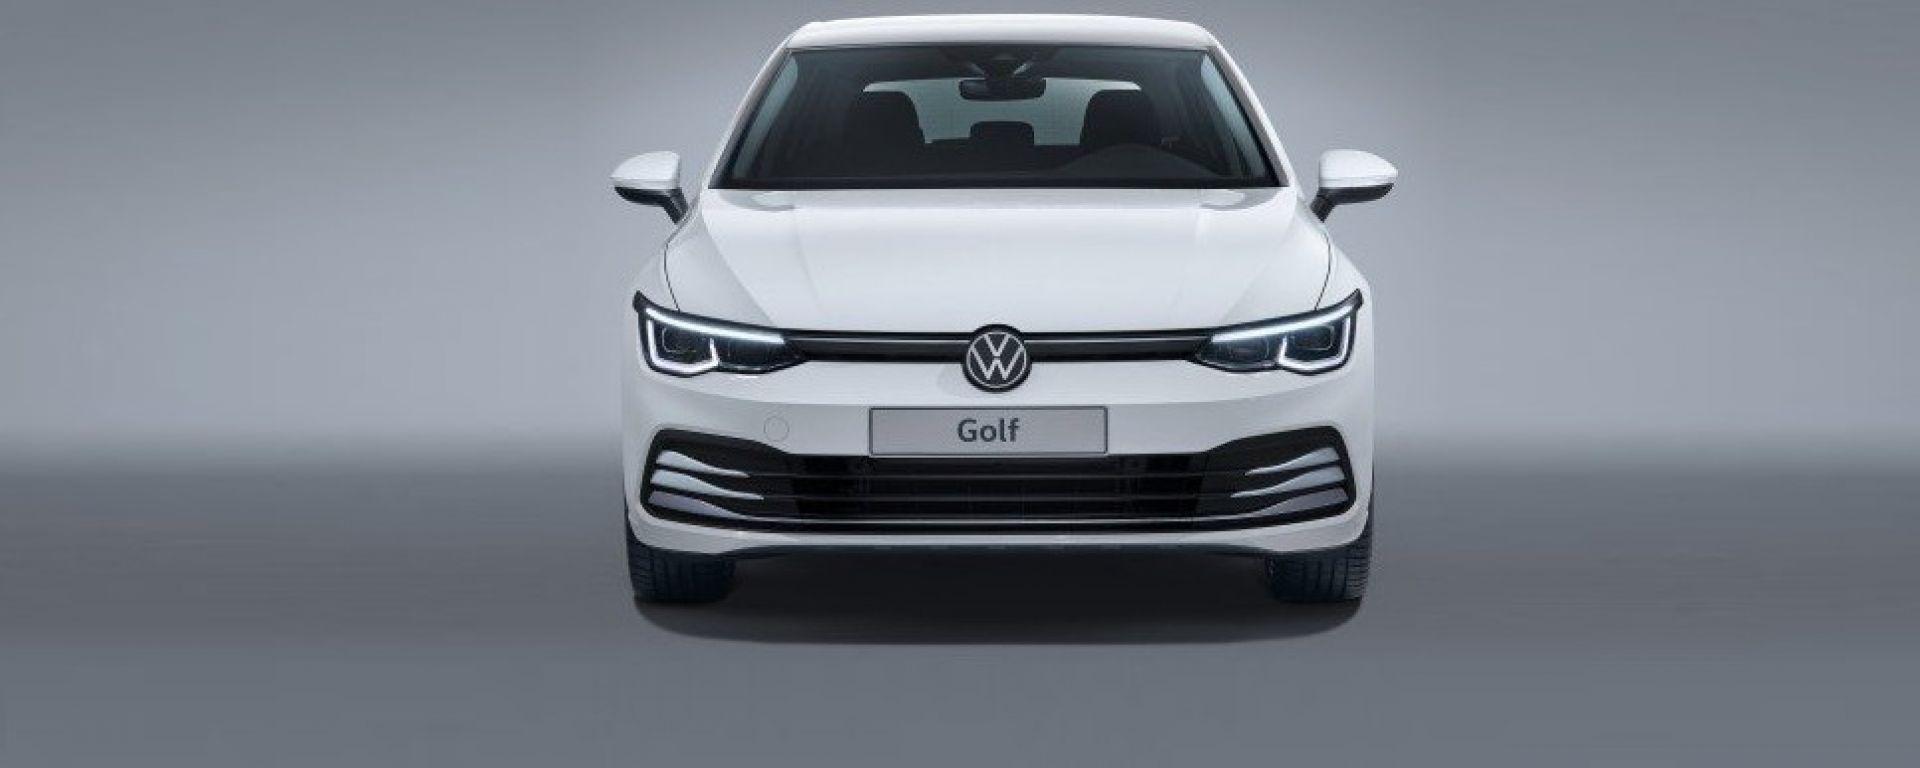 Volkswagen Golf 8 2020: una foto del frontale sfuggita in rete